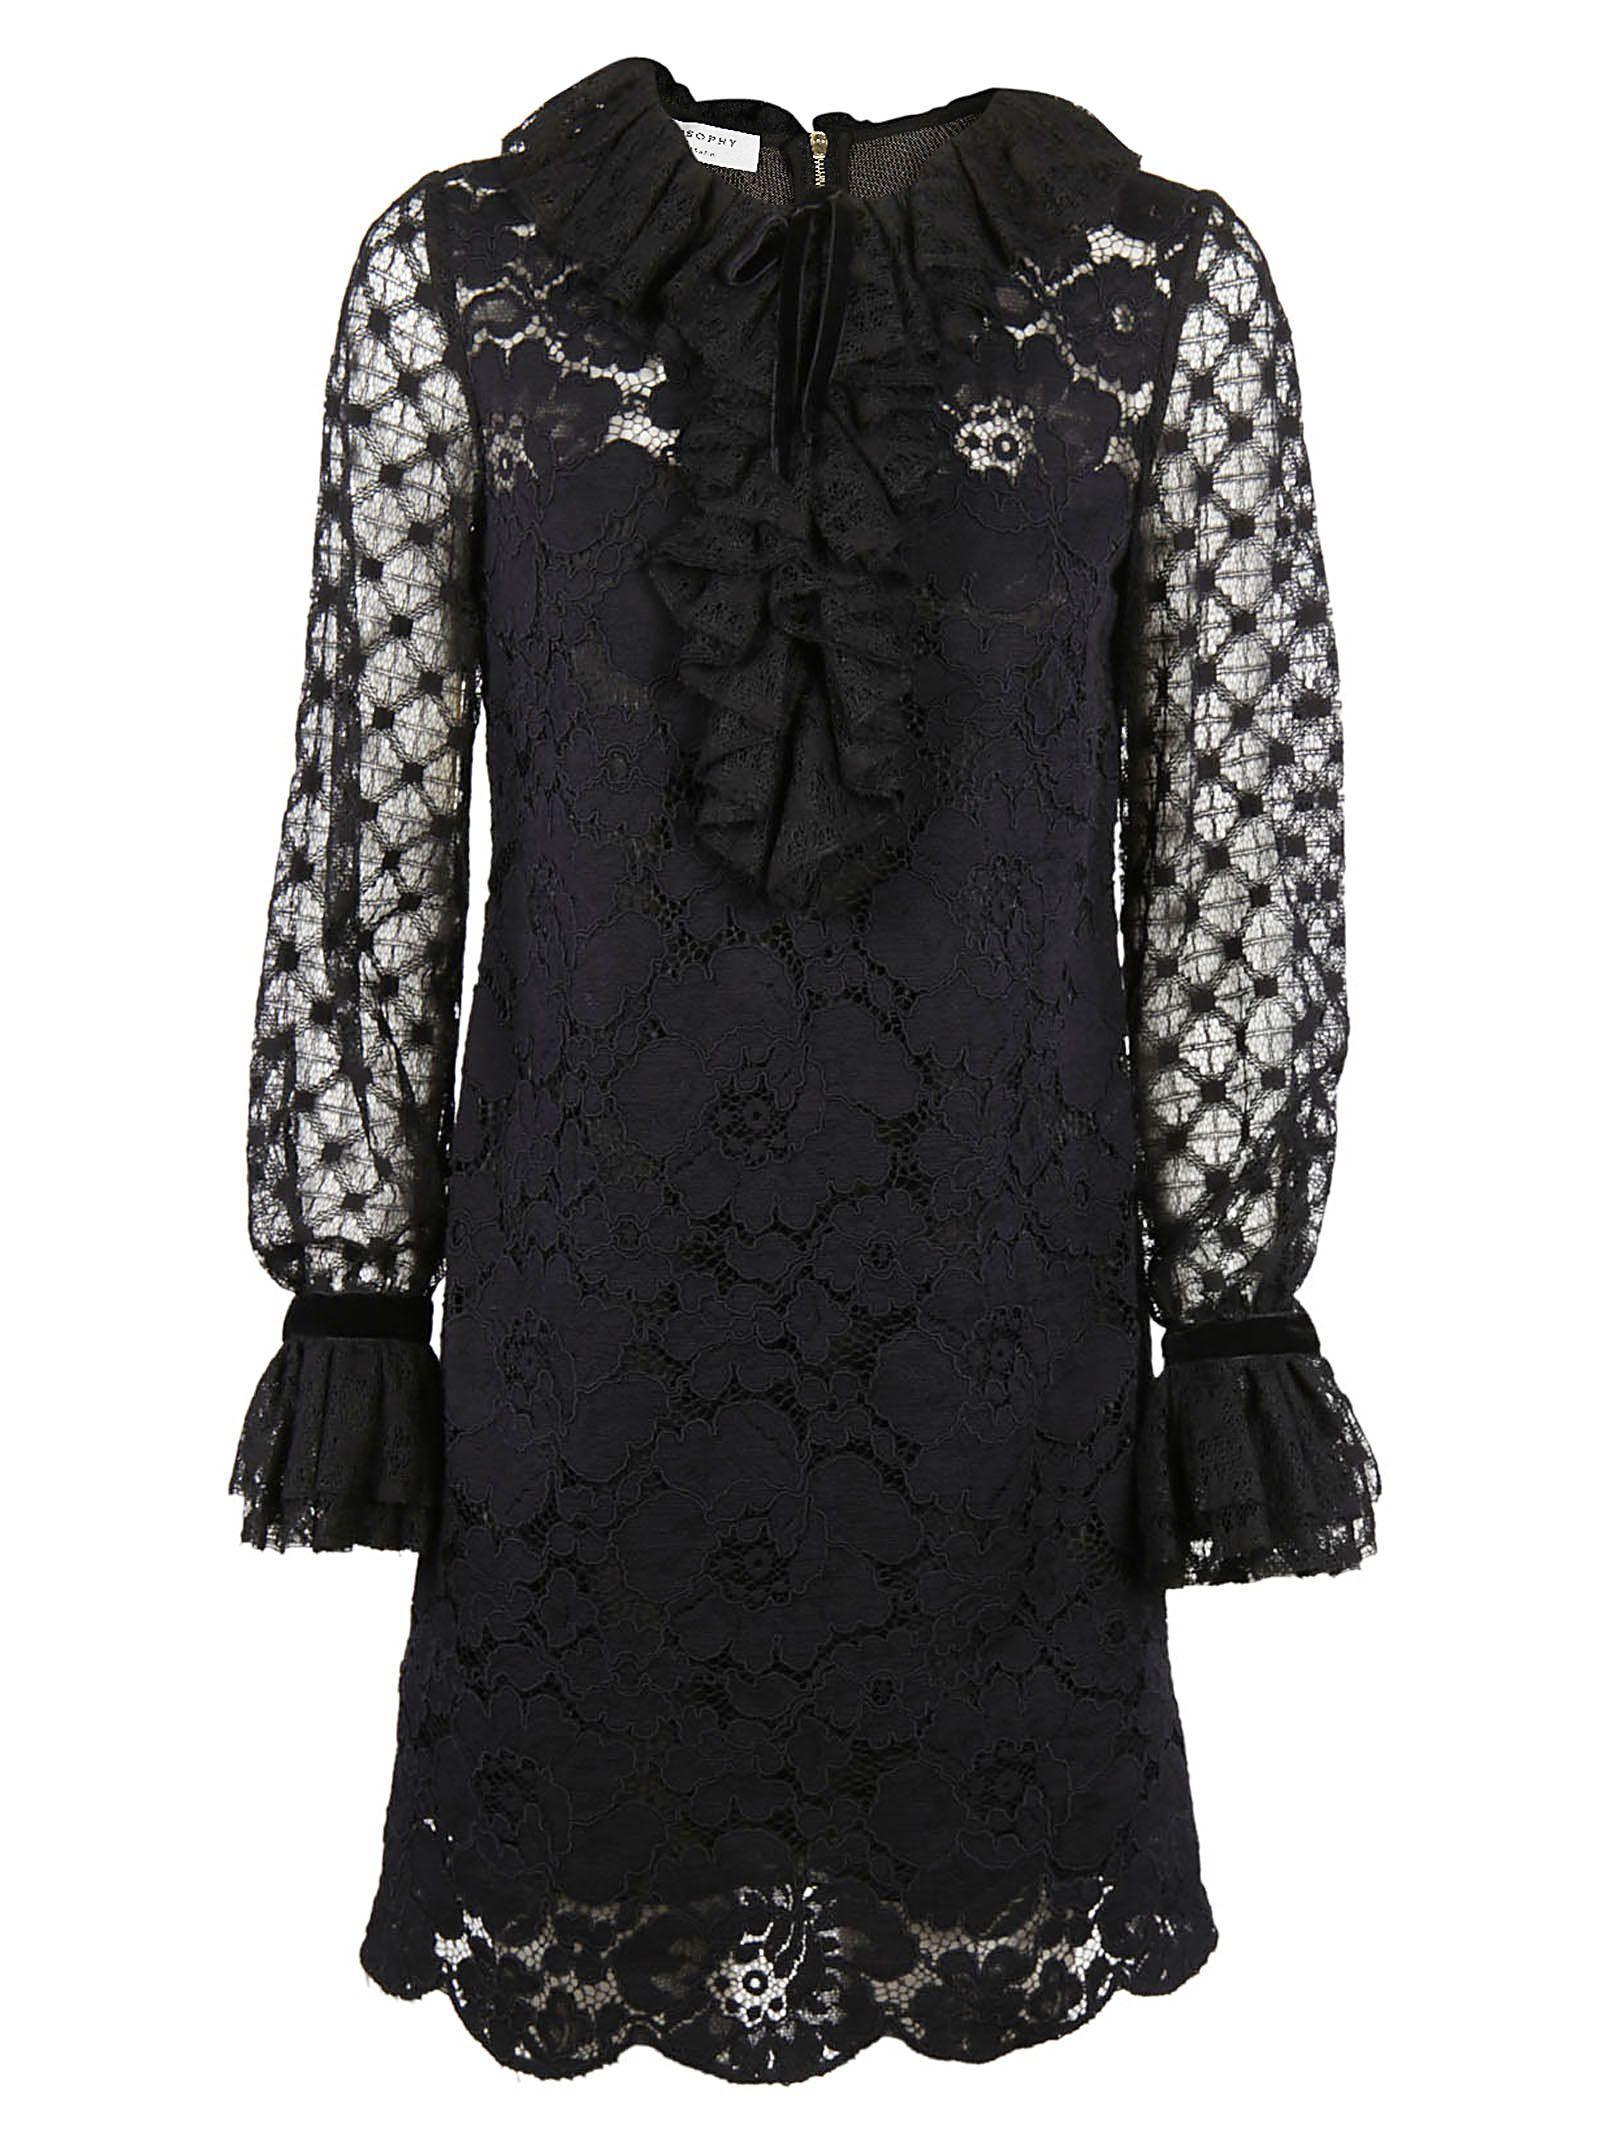 Philosophy Di Lorenzo Serafini Ruffled Lace Dress In Black